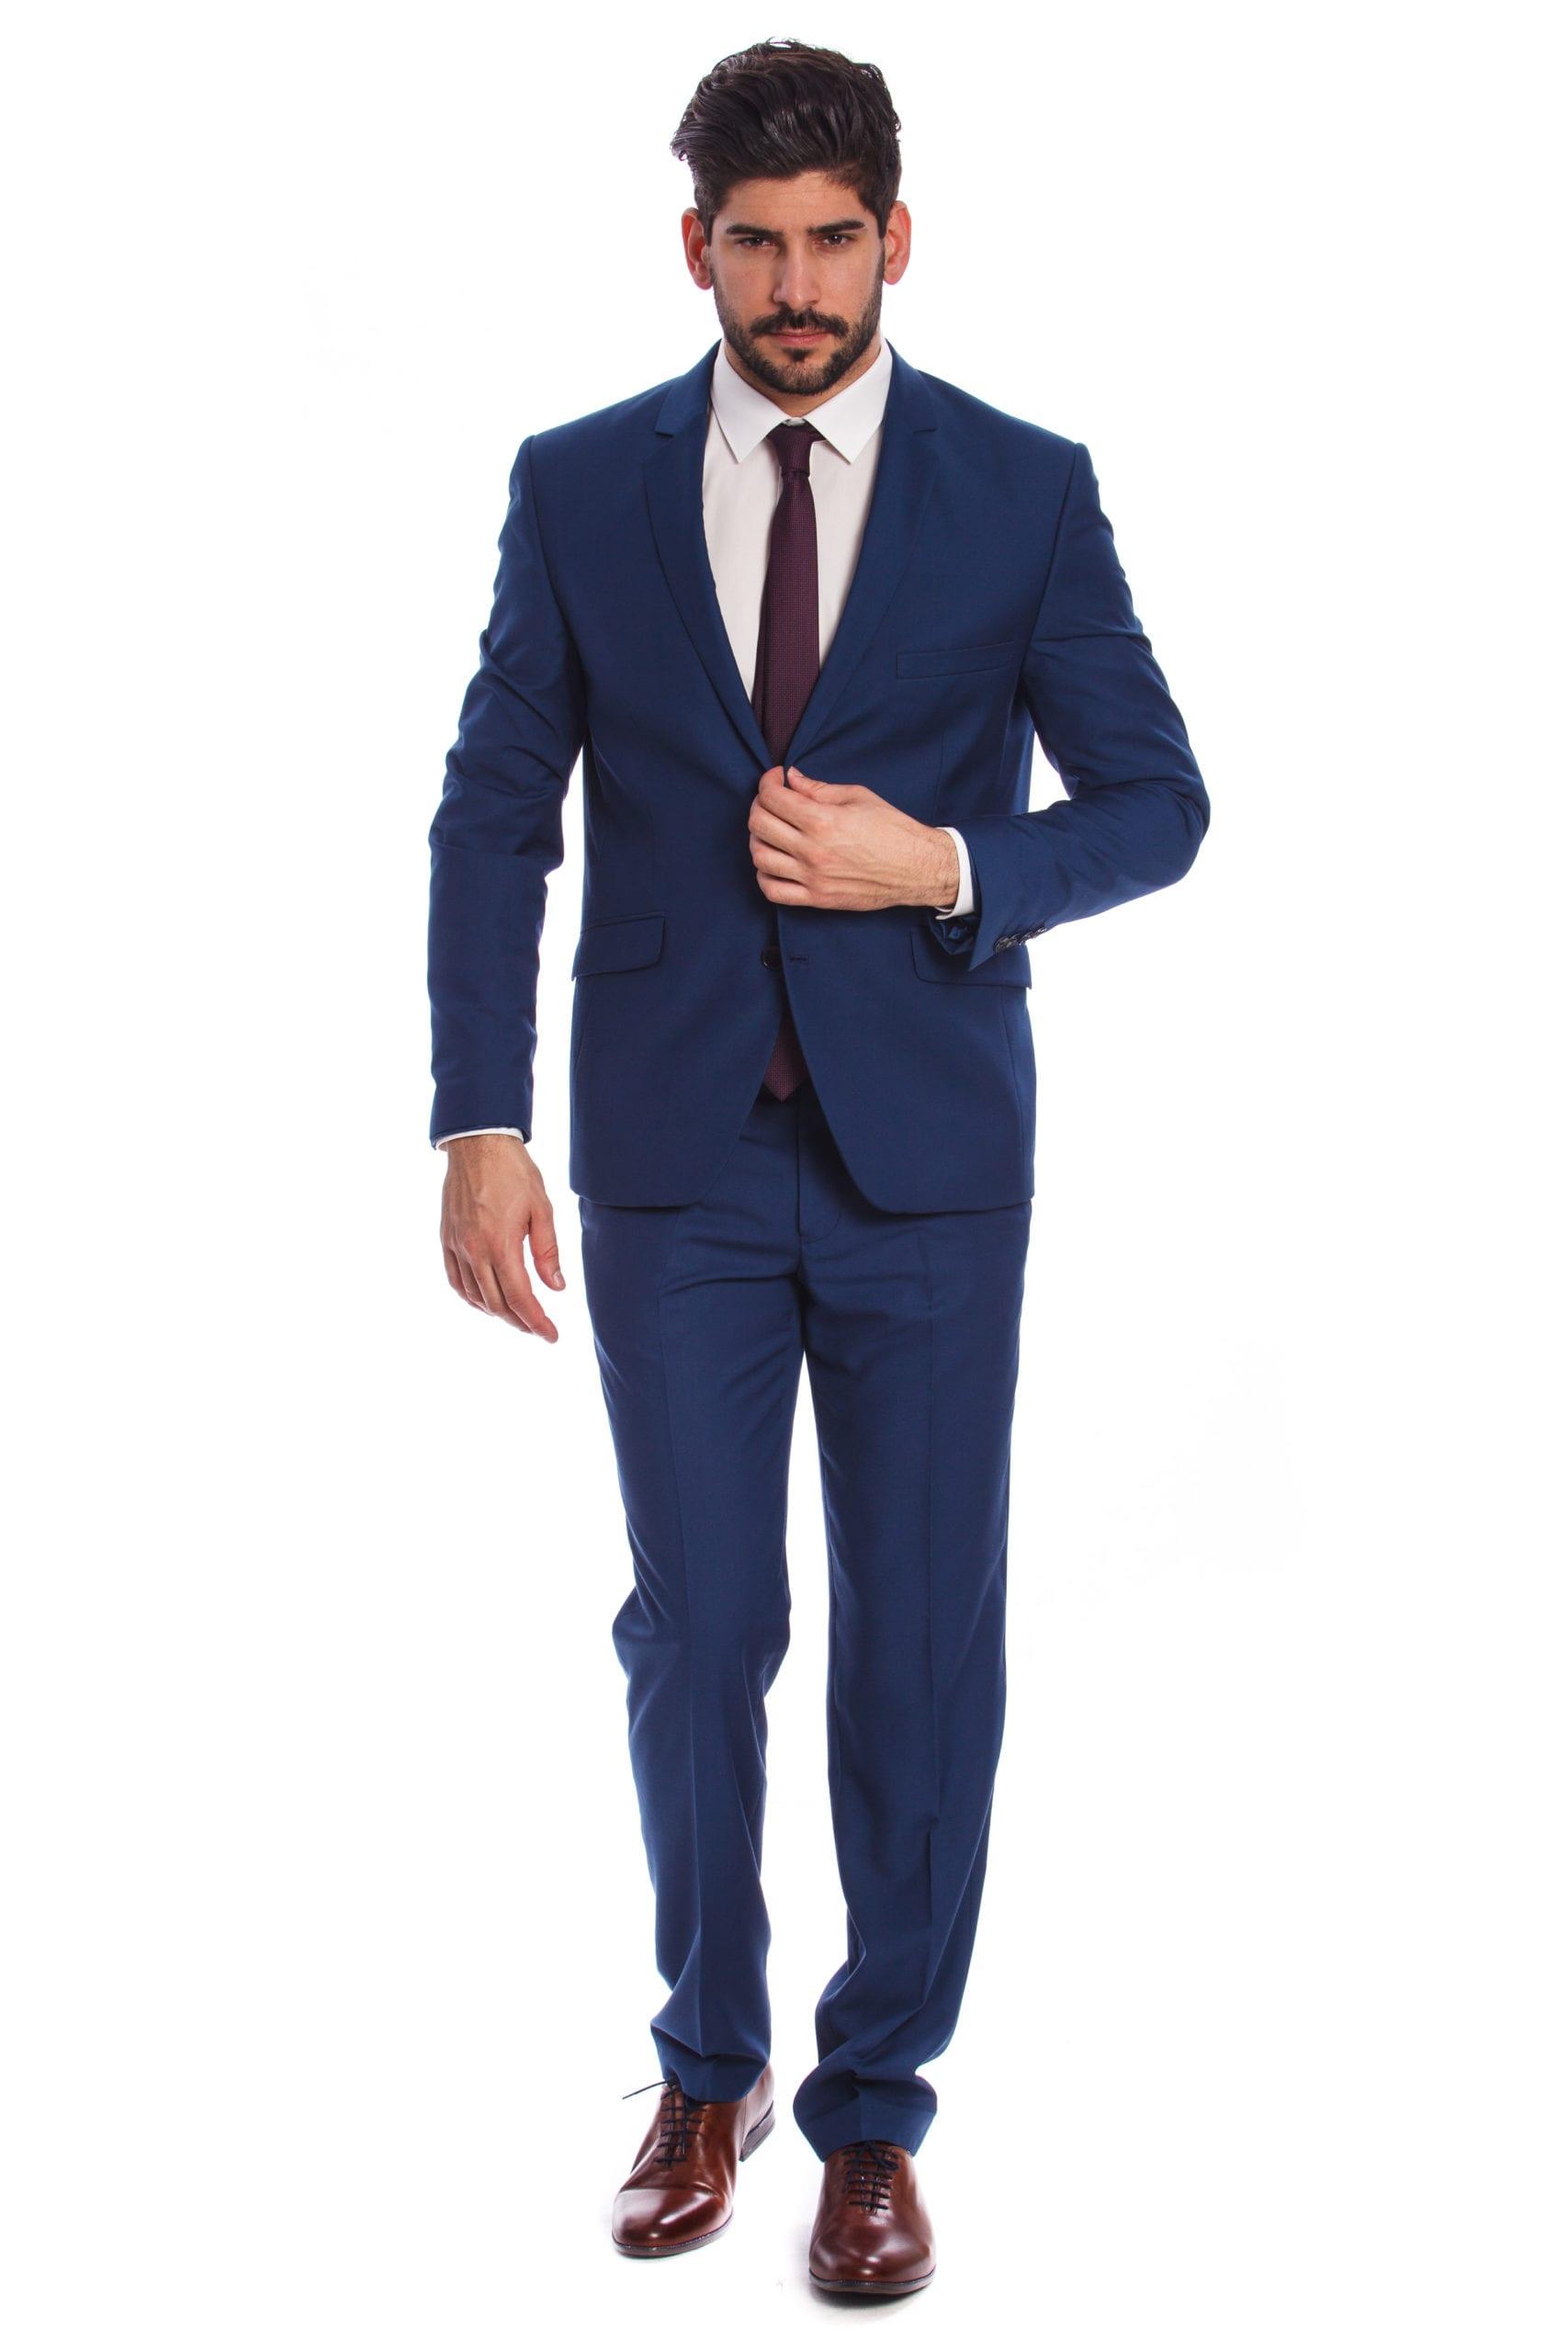 ca74b4d60b Nápoly Világoskék Slim Fit Öltöny - Elite Fashion Öltönyház